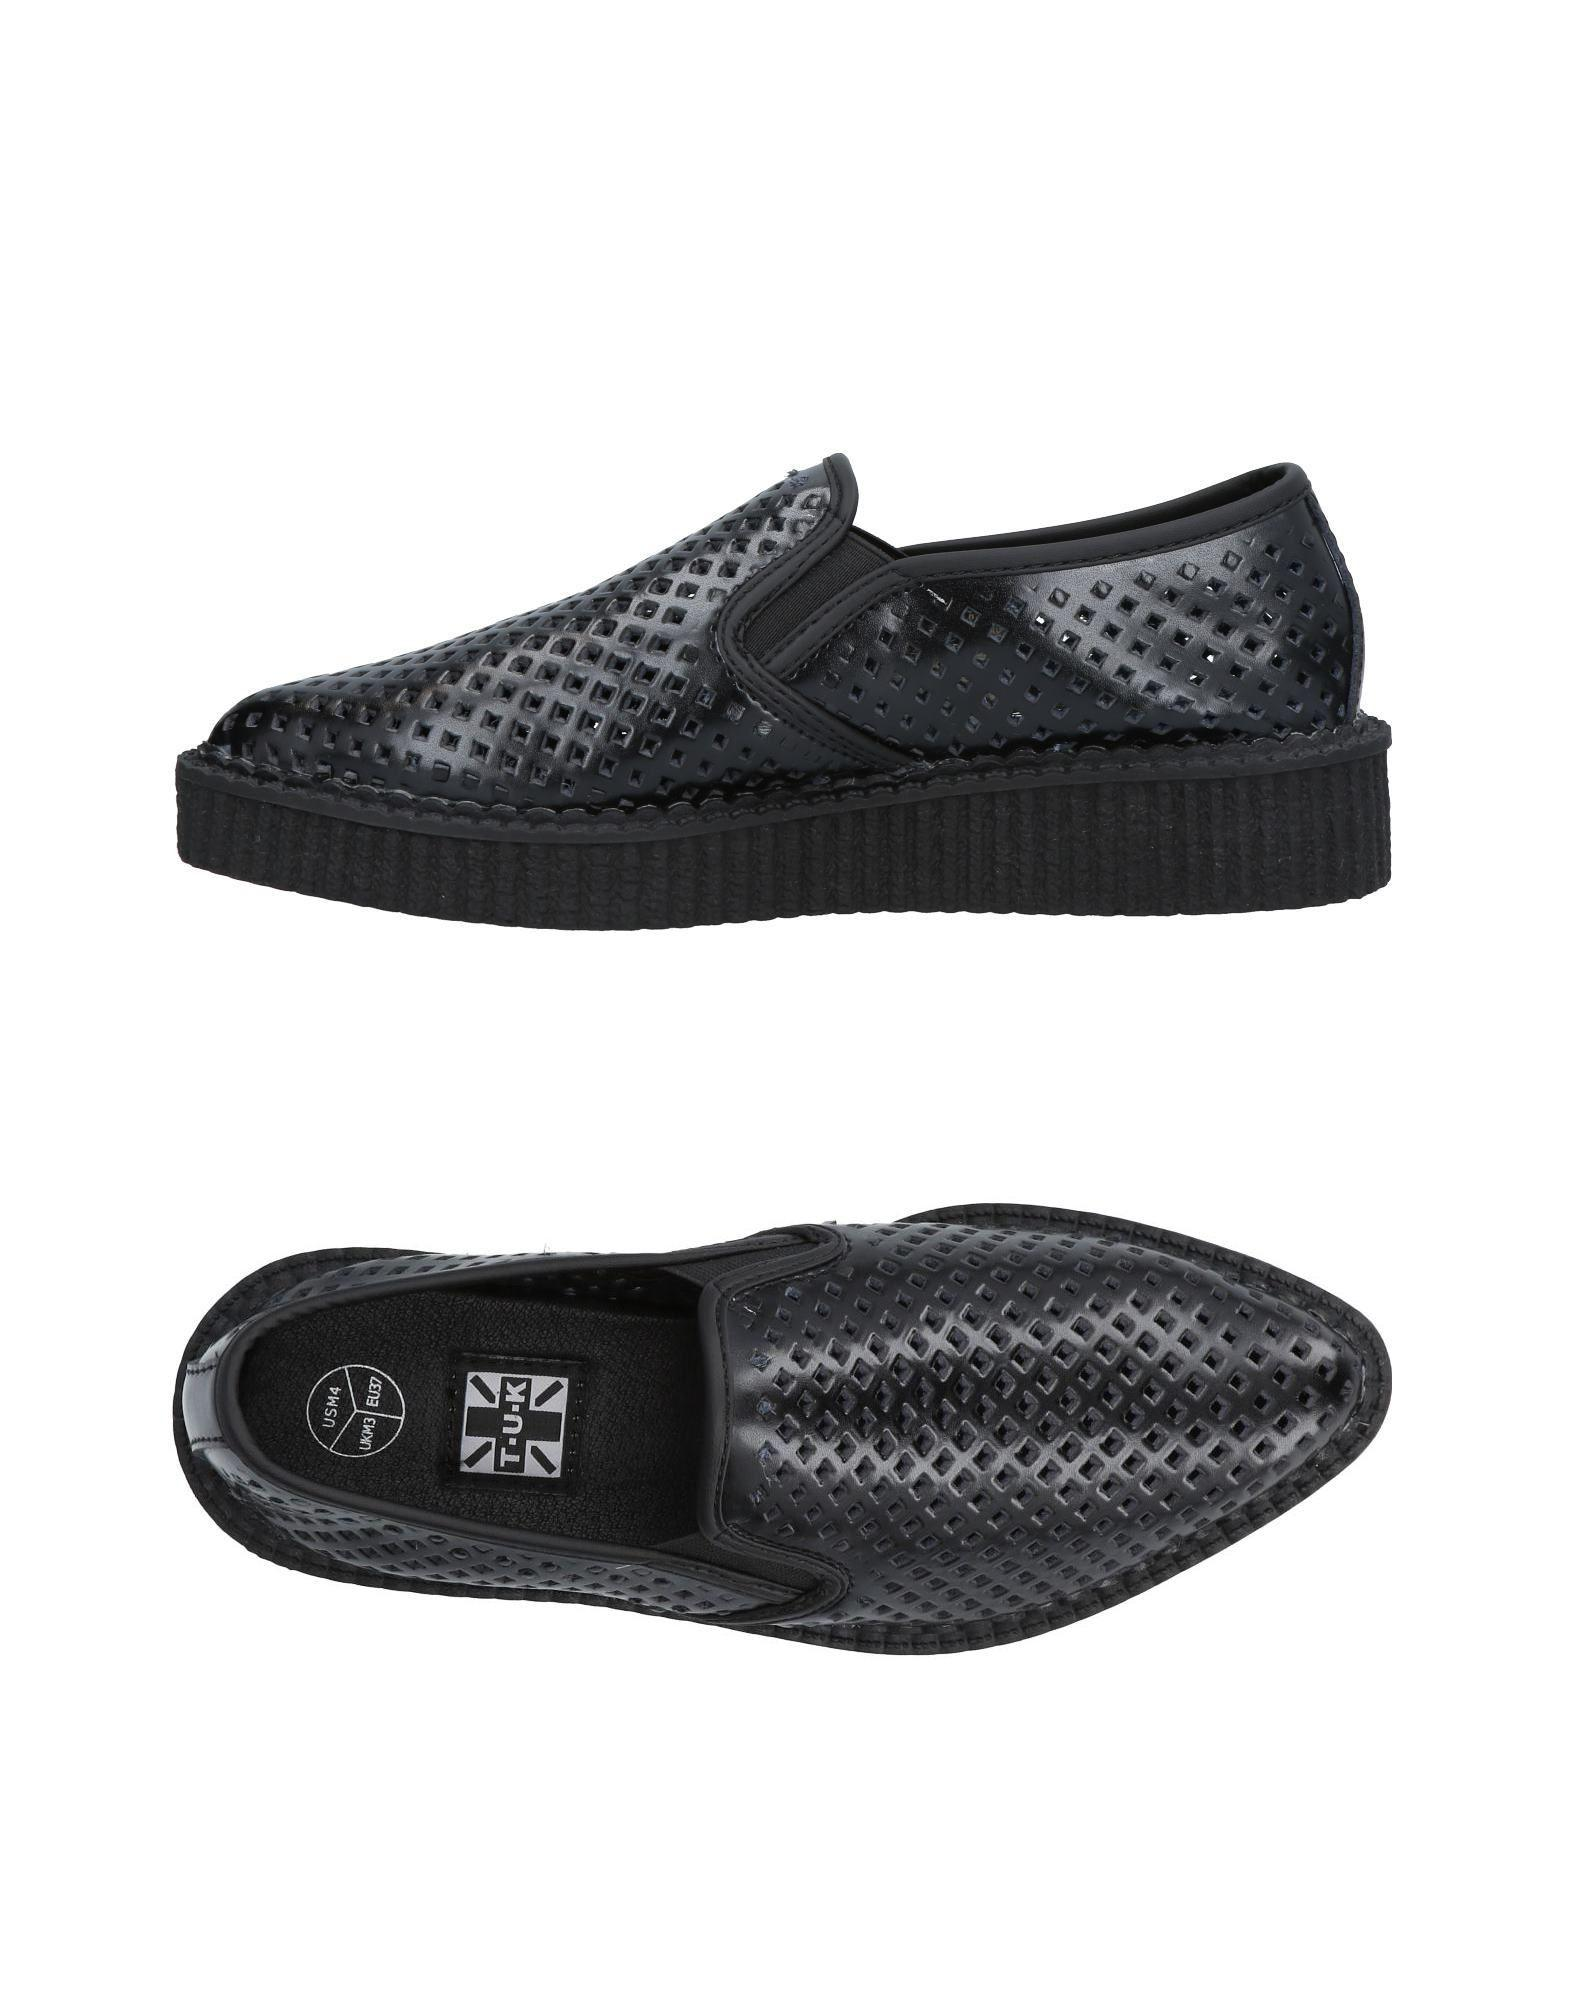 FOOTWEAR - Low-tops & sneakers T.U.K. WL6xl